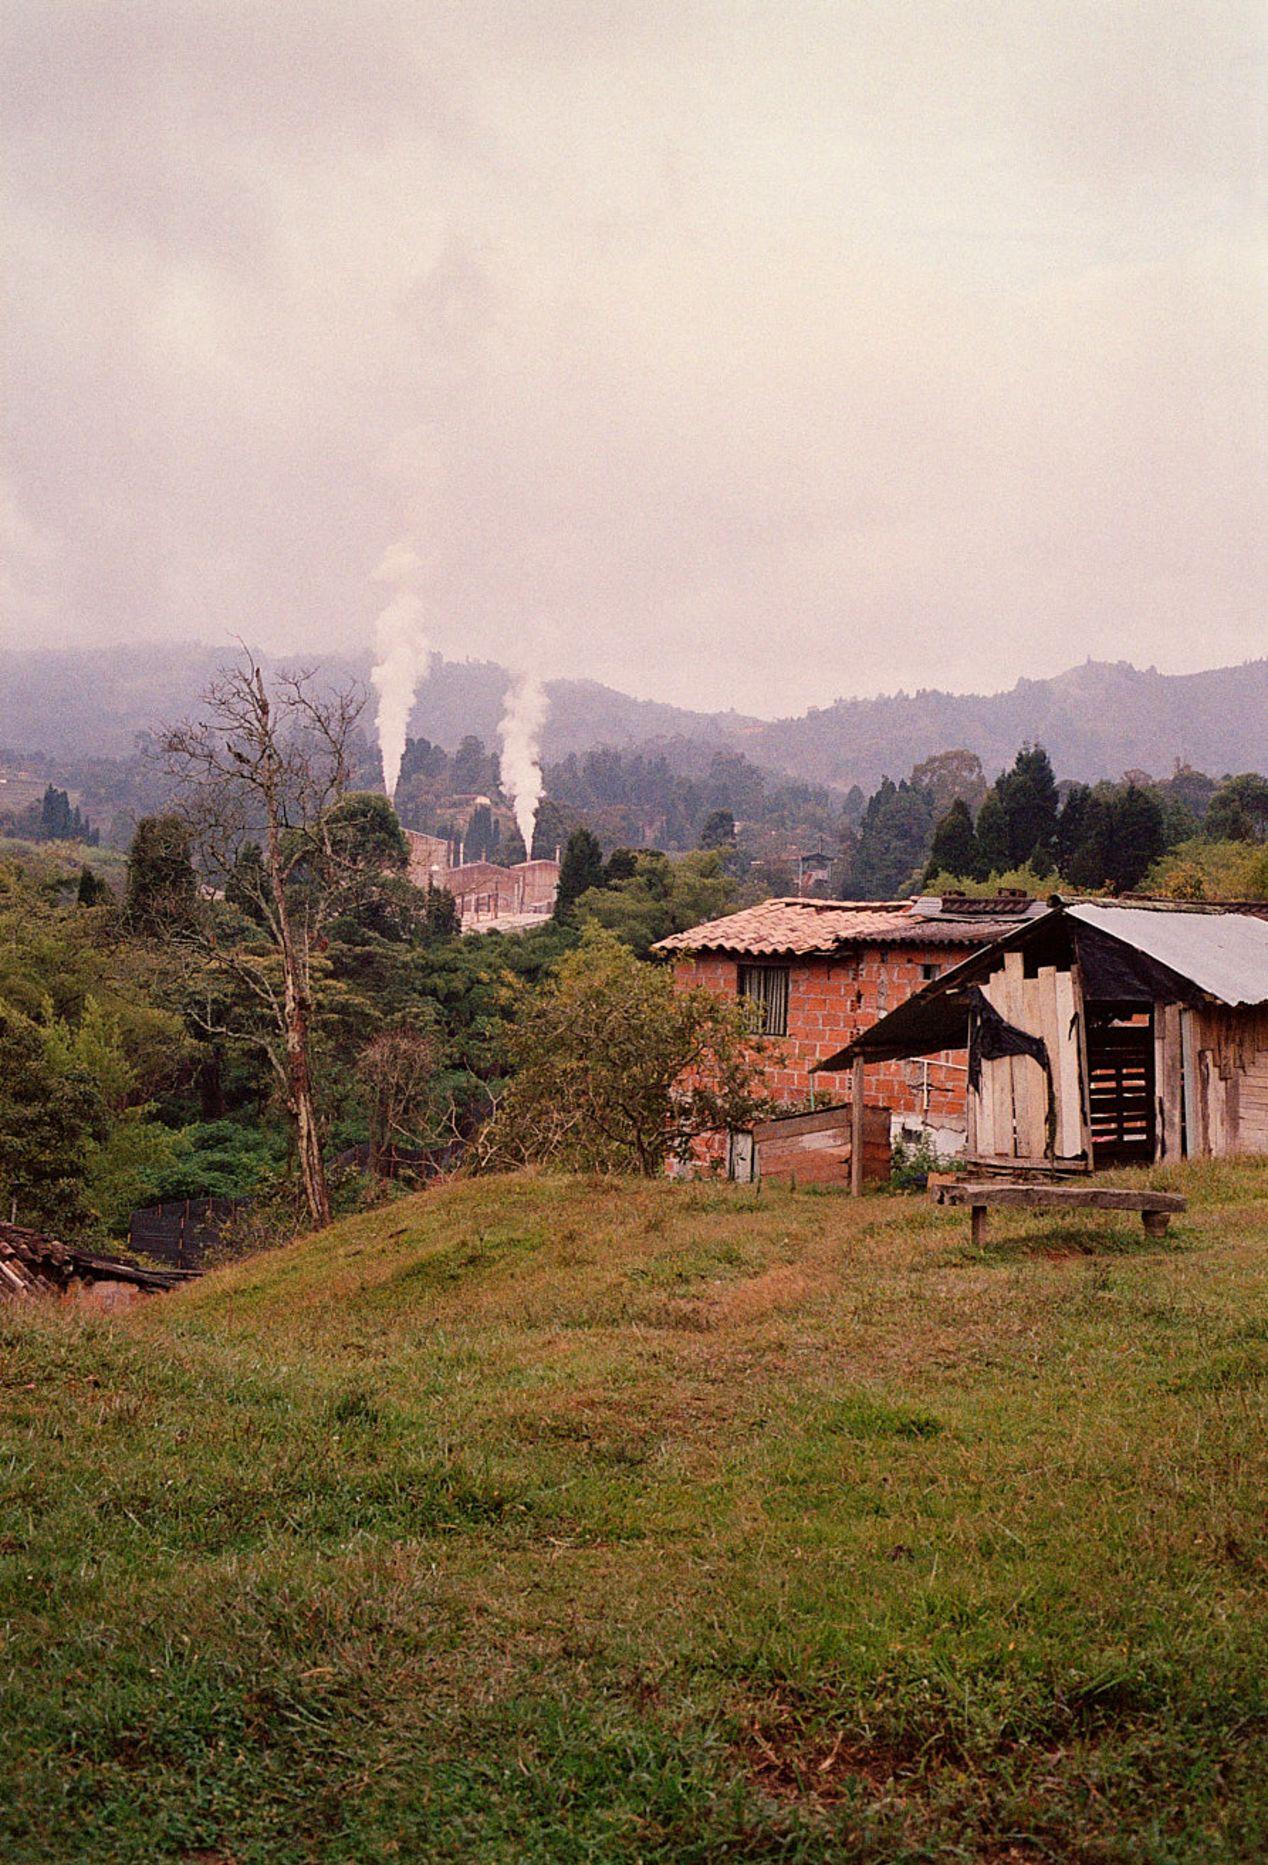 A nondescript scene in rural Colombia. Shot on Kodak Portra 400 with Minolta XD-7 and MD Rokkor 50mm f/1.4.